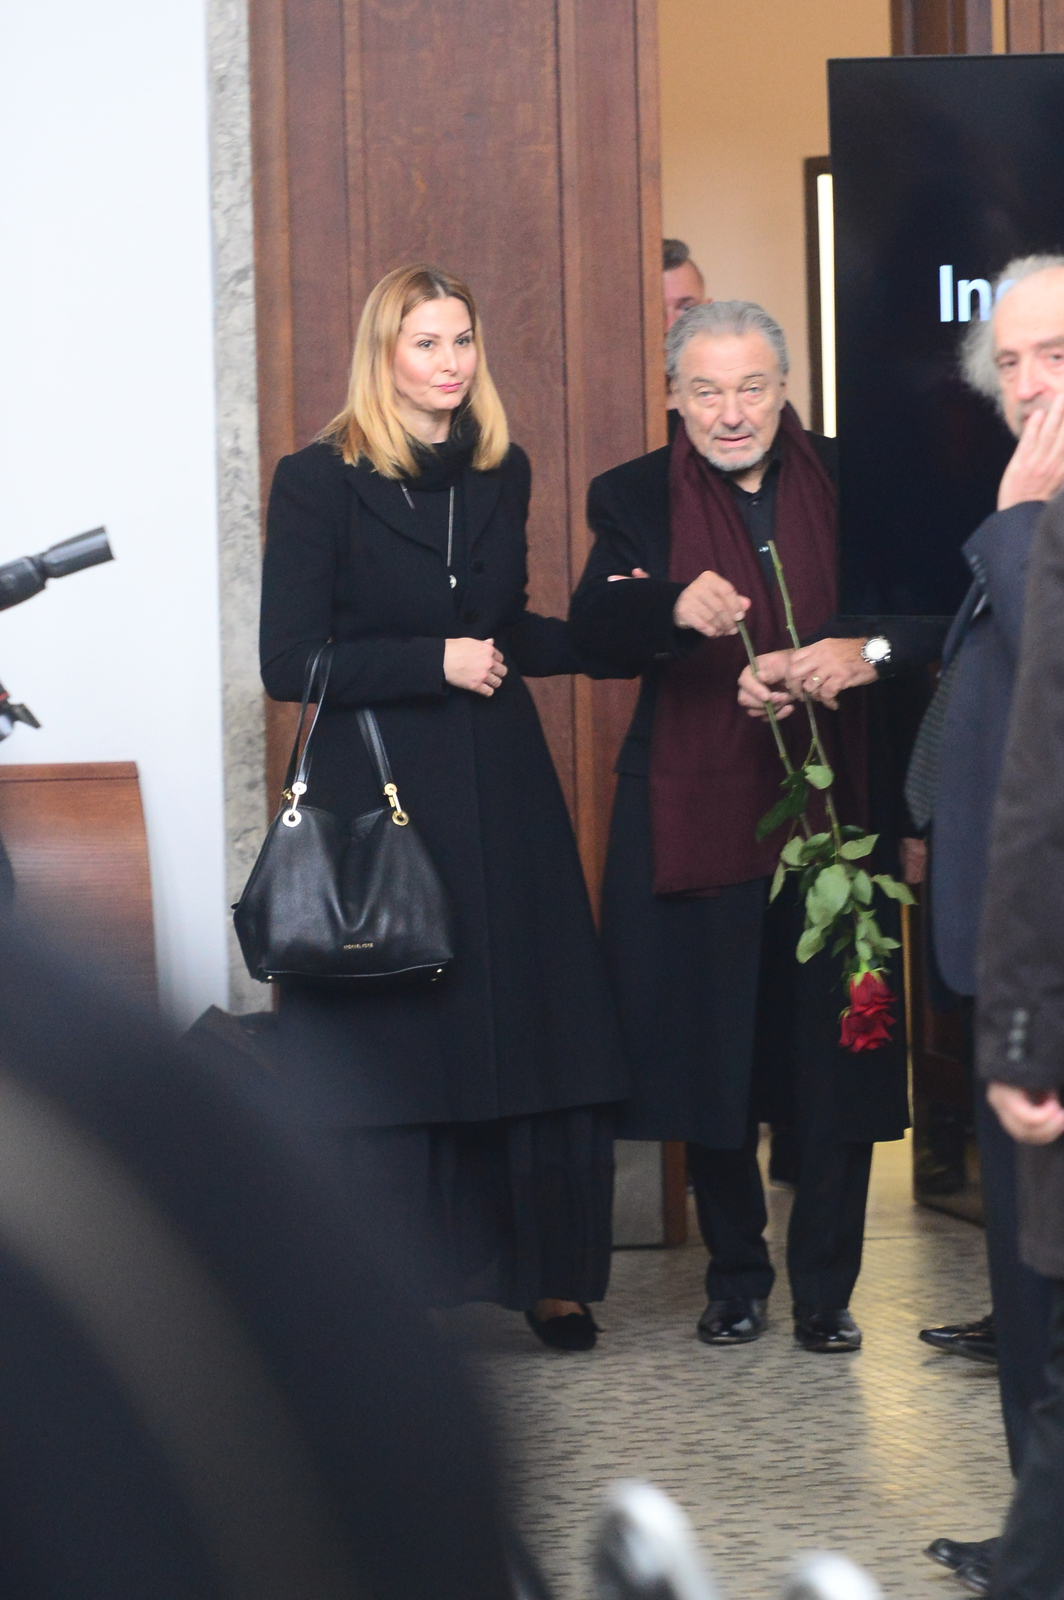 Karel Gott s Ivanou na pohřbu kamaráda Karla Štědrého